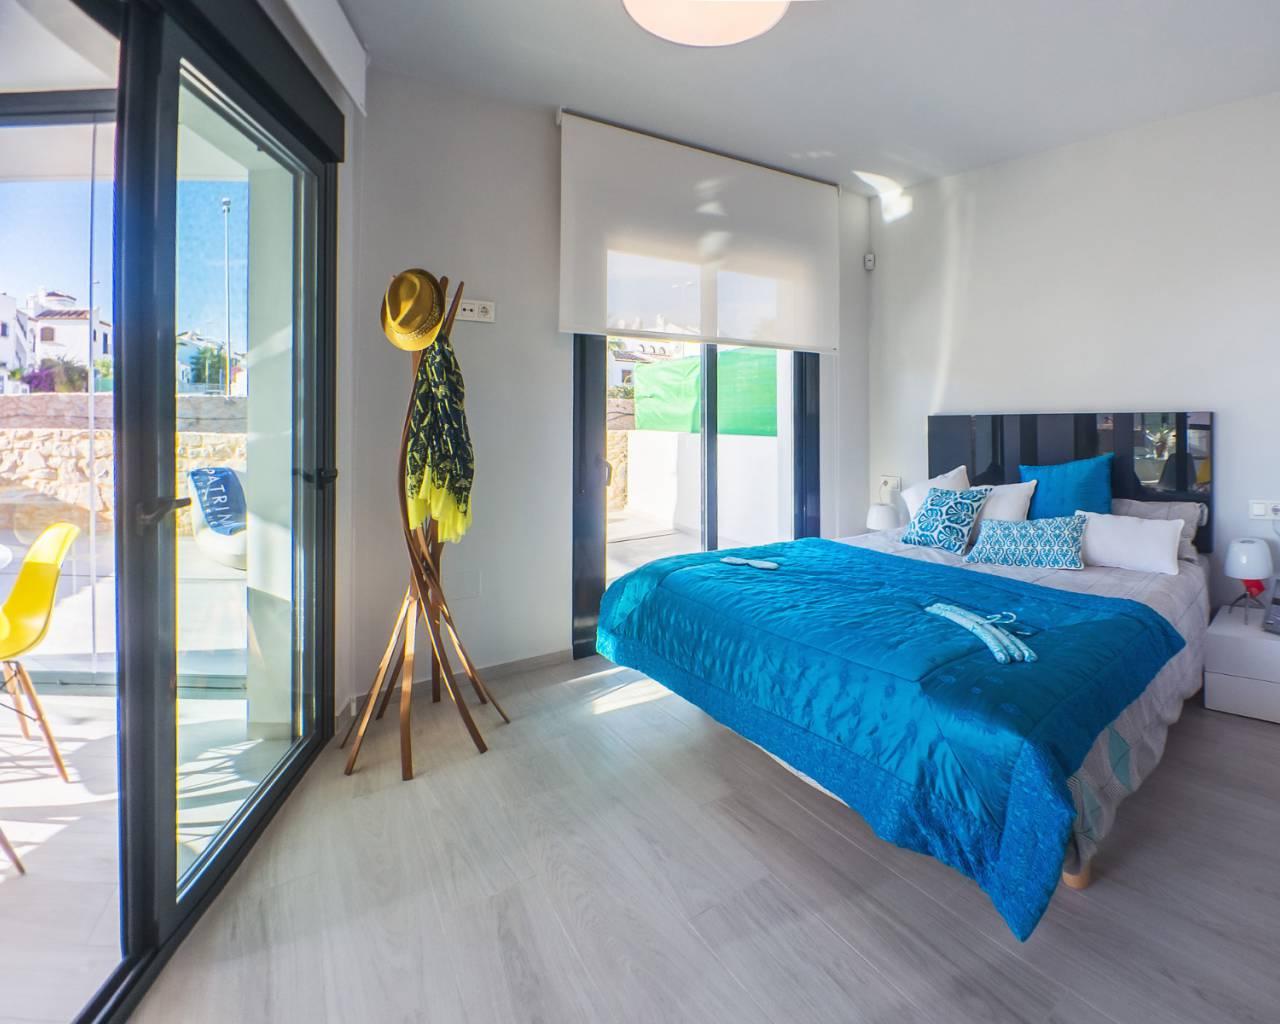 nieuwbouw-appartement-orihuela-costa-villamartin-golf_683_xl